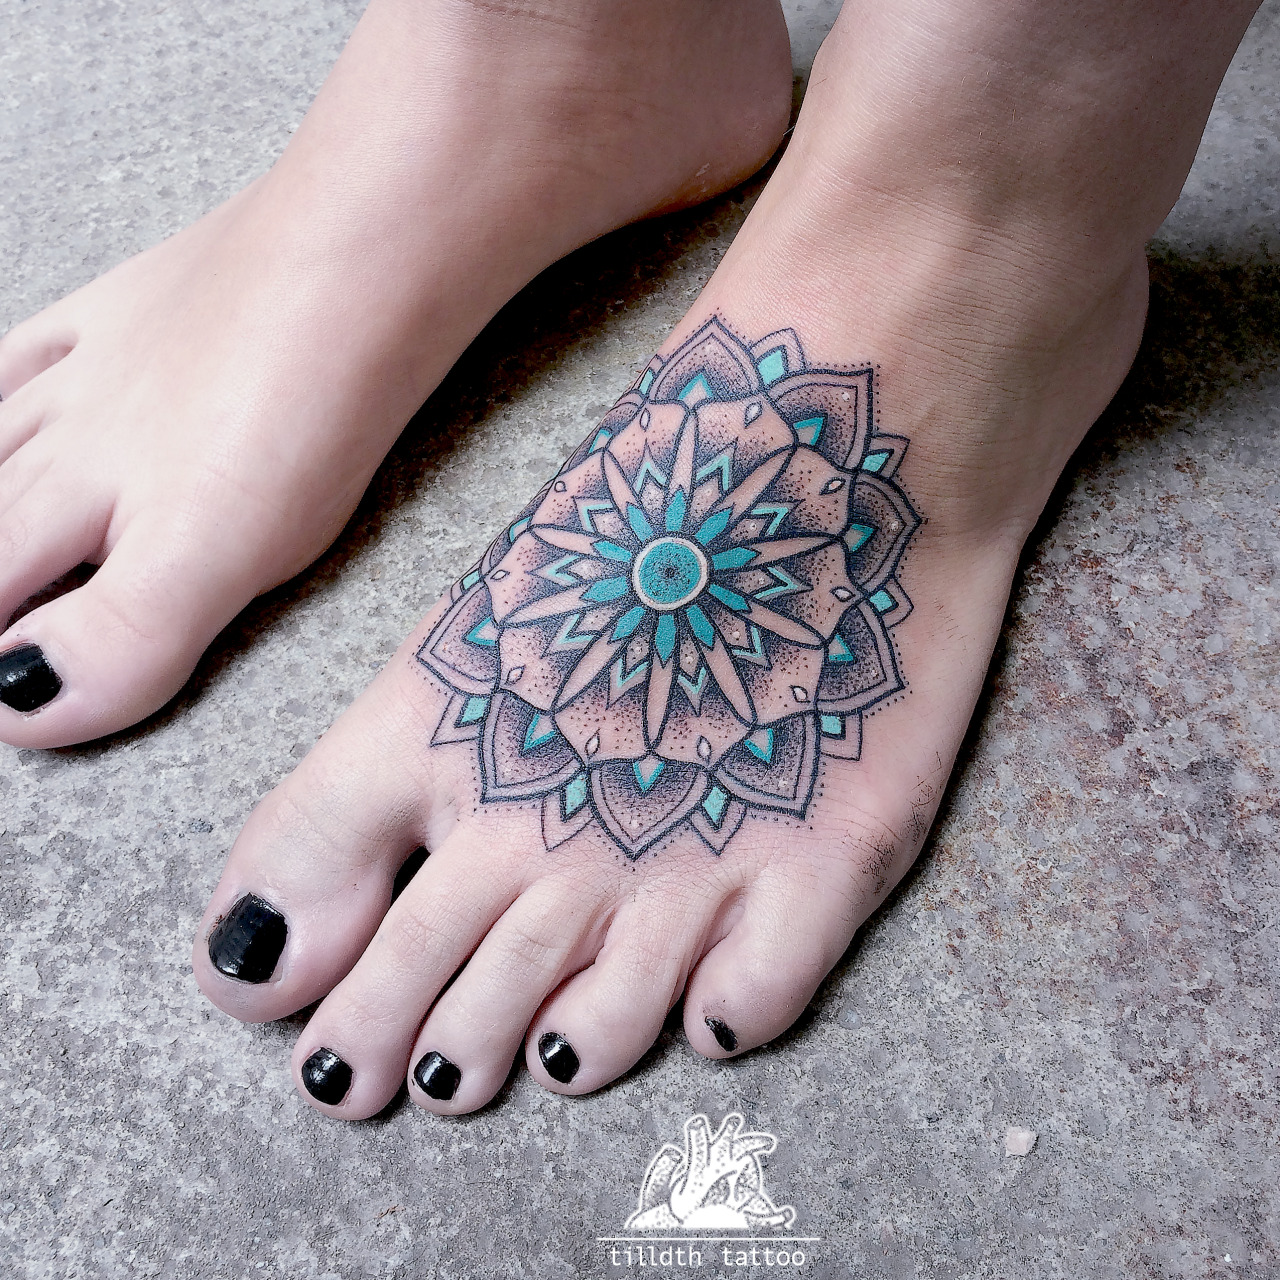 Tilldth Tattoo - the vandallist (29)